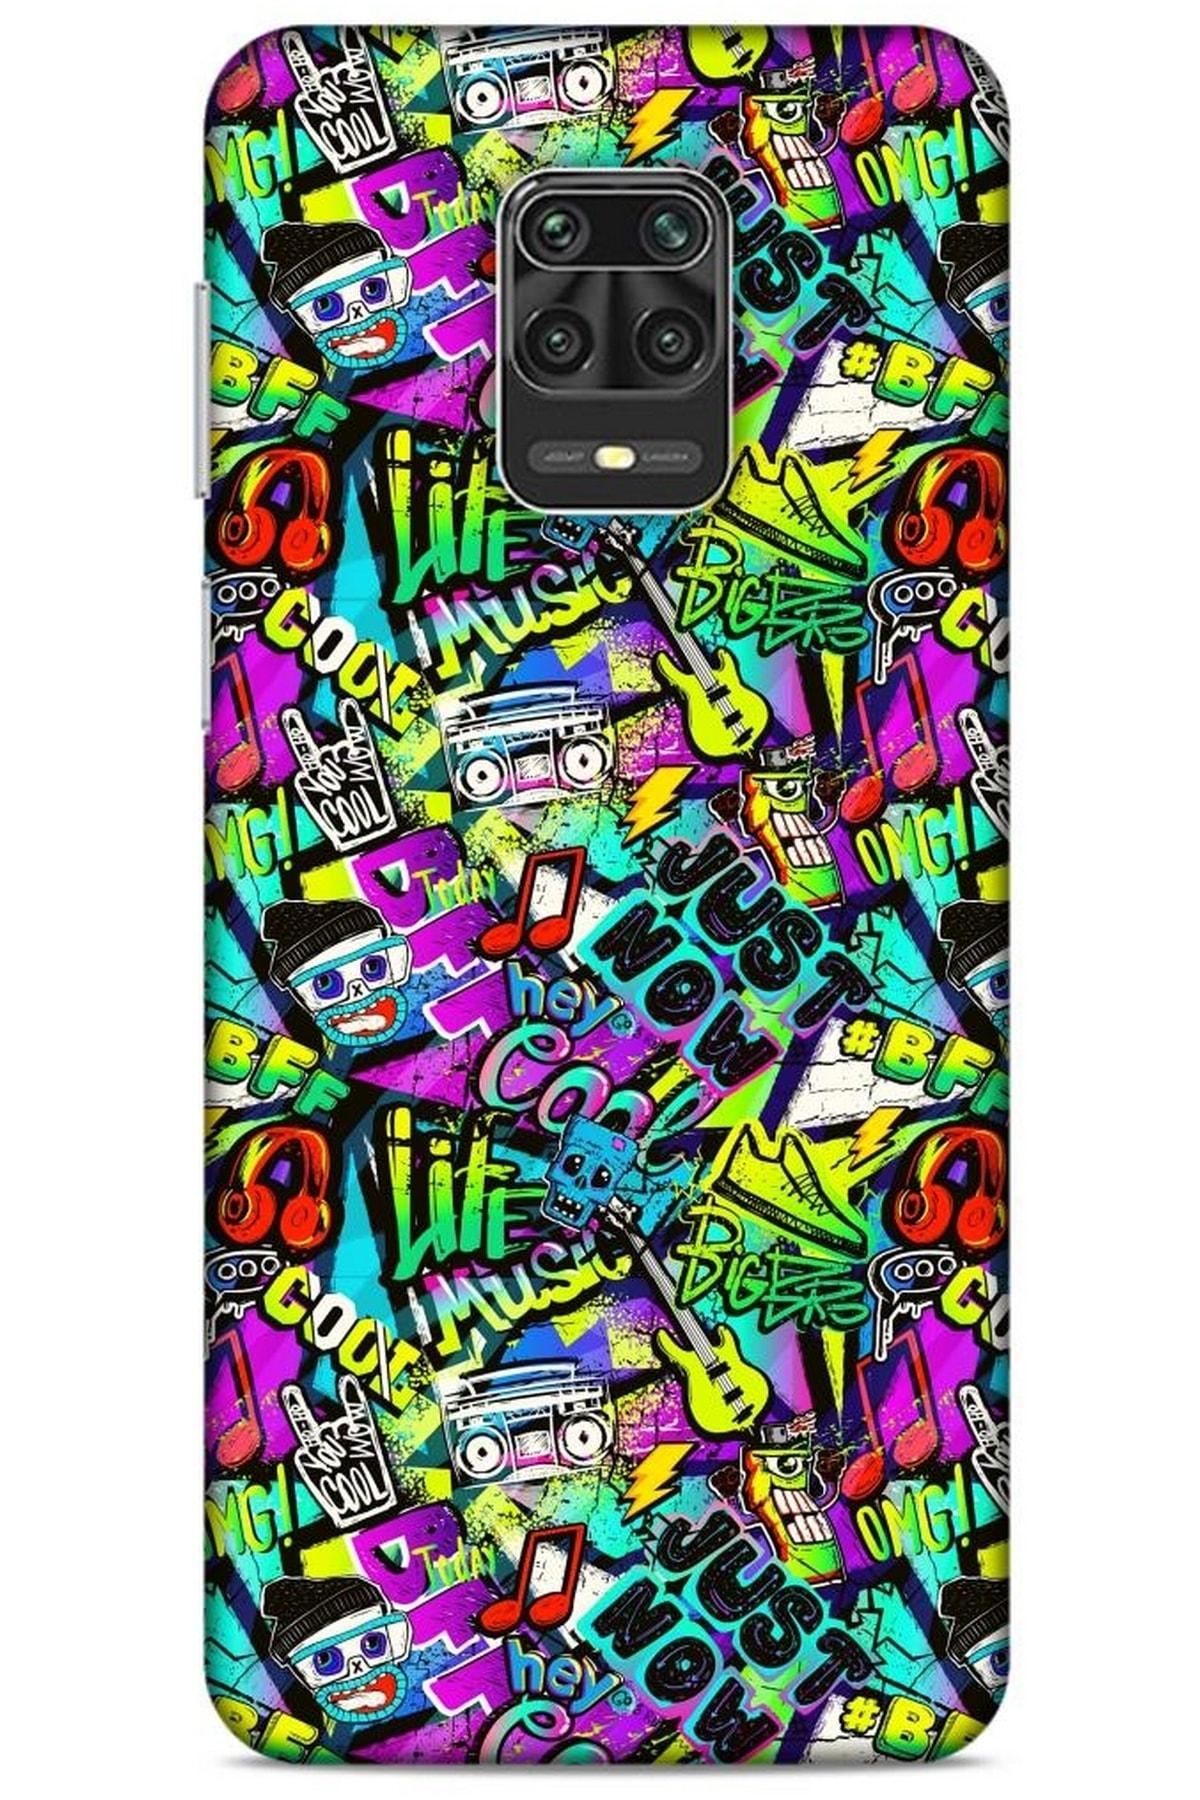 Lopard Graffitix (9) Desenli Silikon Kapak Xiaomi Redmi Note 9 Pro Kılıf 1